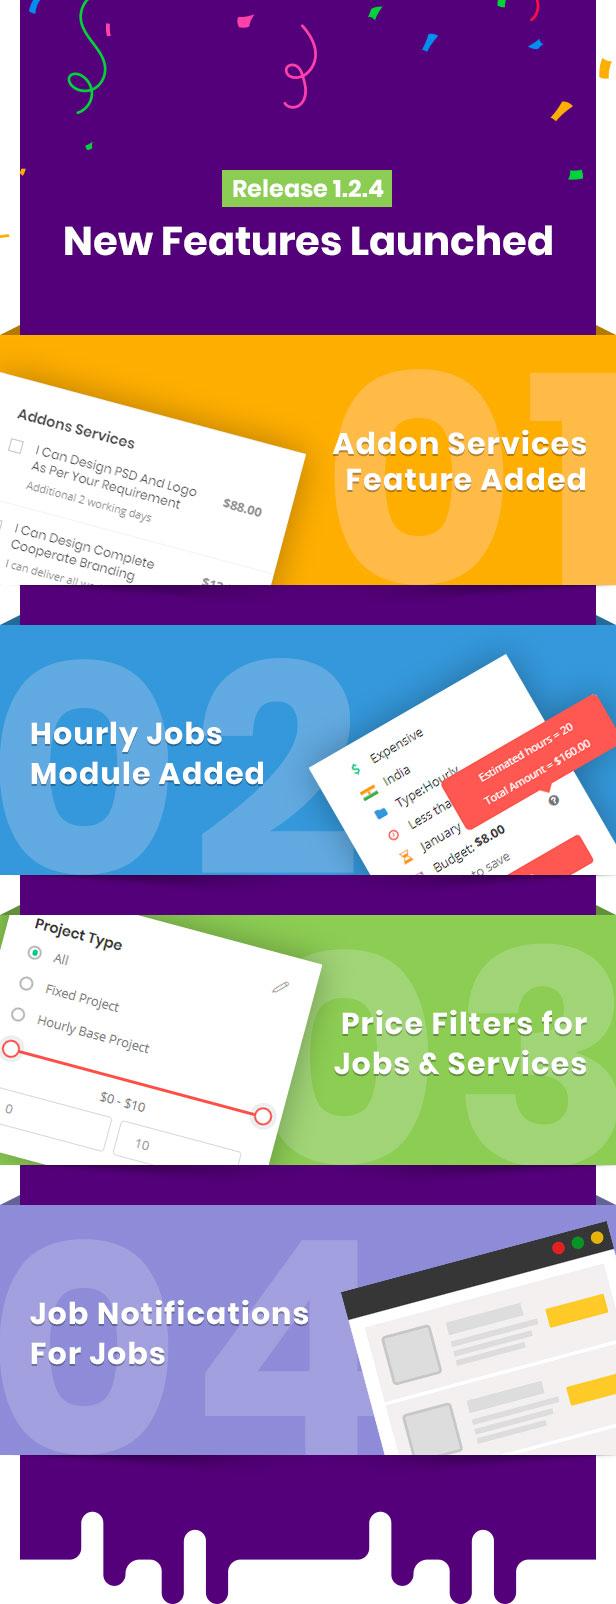 Workreap - Freelance Marketplace and Directory WordPress Theme - 14